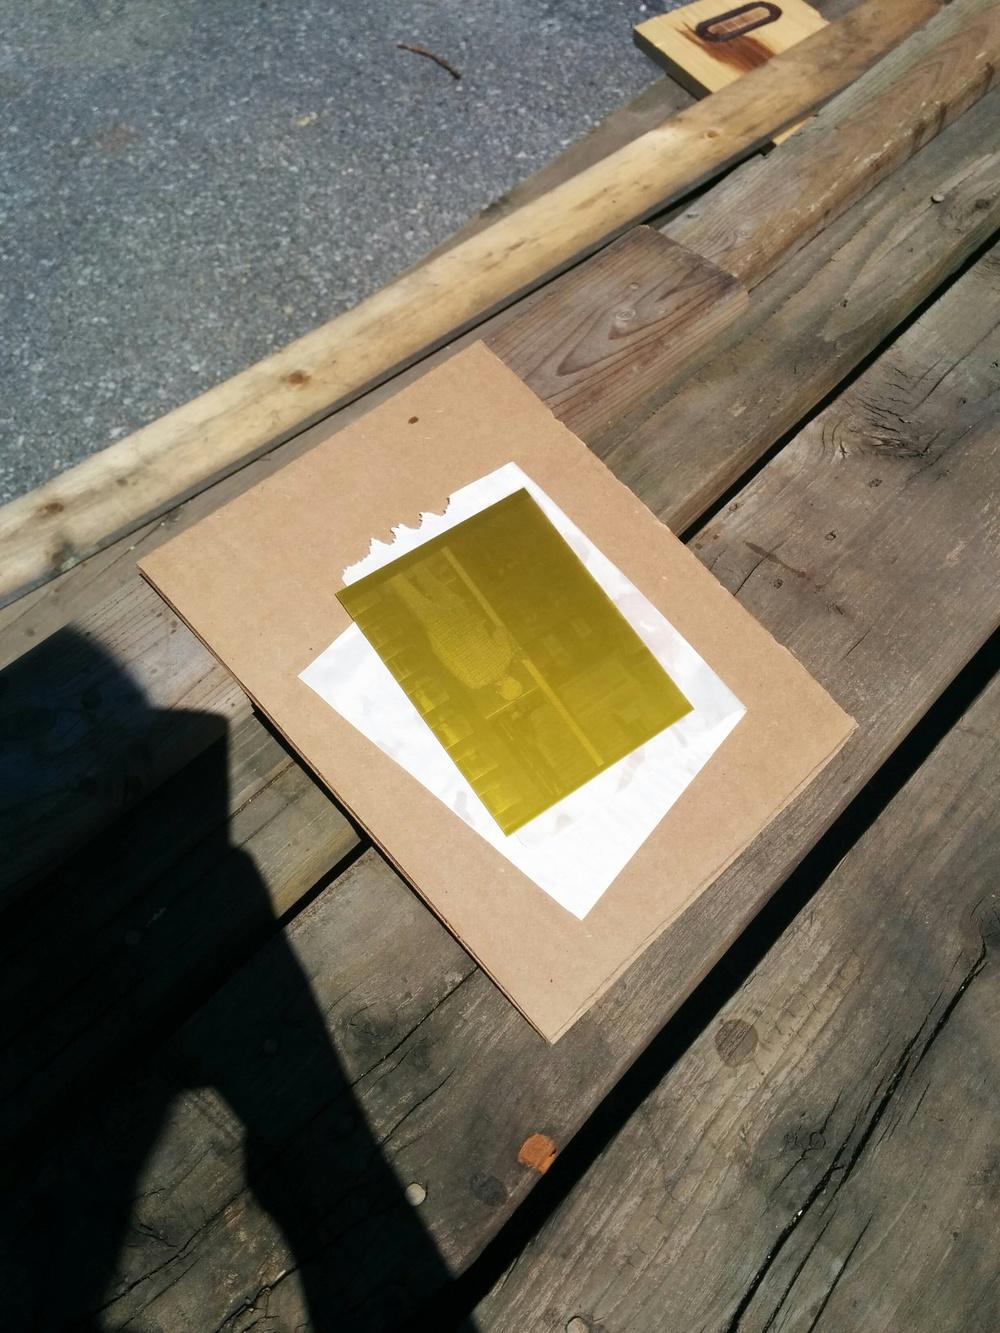 Exposing solarplates in the sun